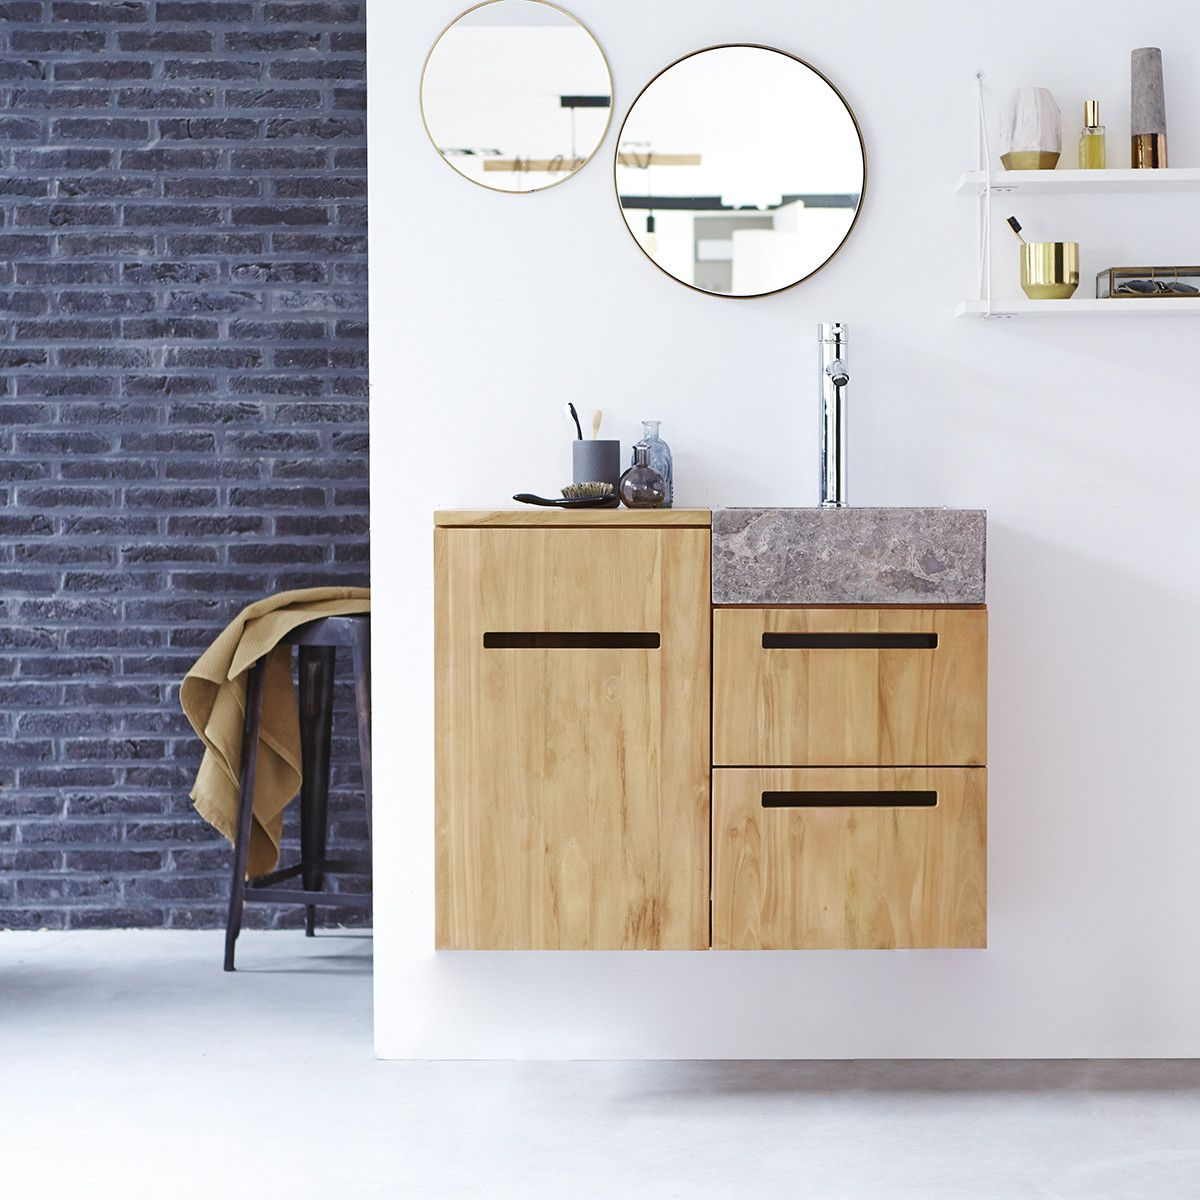 Line Teak And Marble Wash Unit 85 In 2020 Teak Bathroom Simple